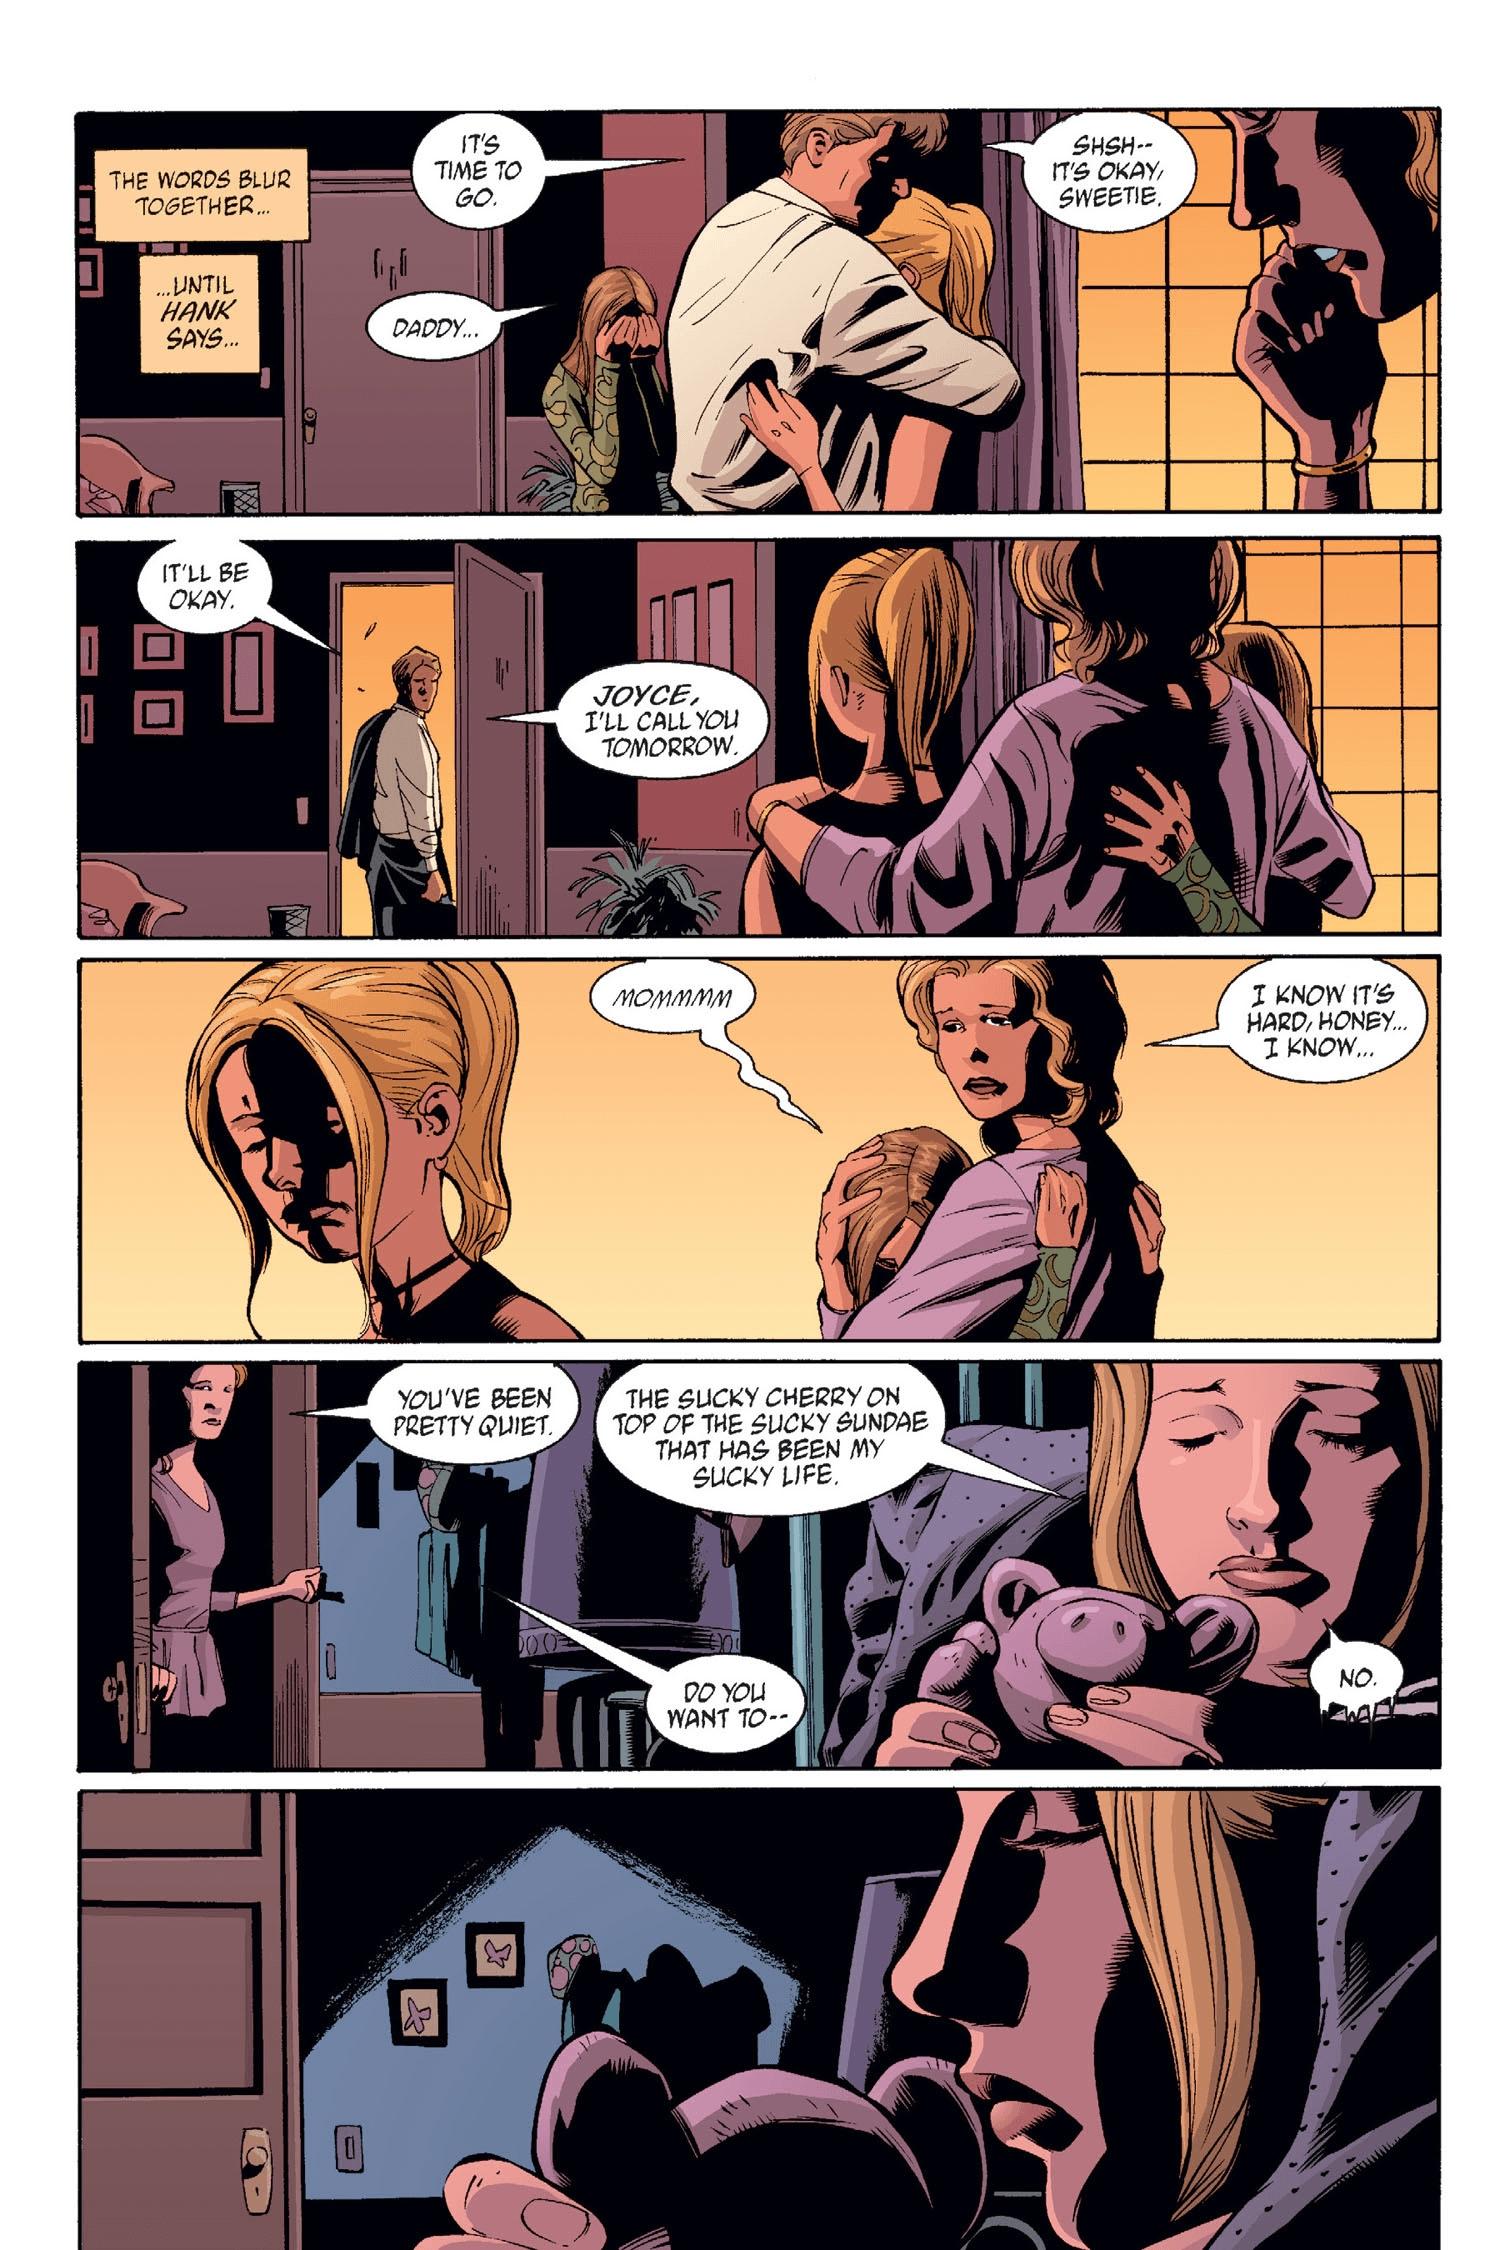 Read online Buffy the Vampire Slayer: Omnibus comic -  Issue # TPB 2 - 22